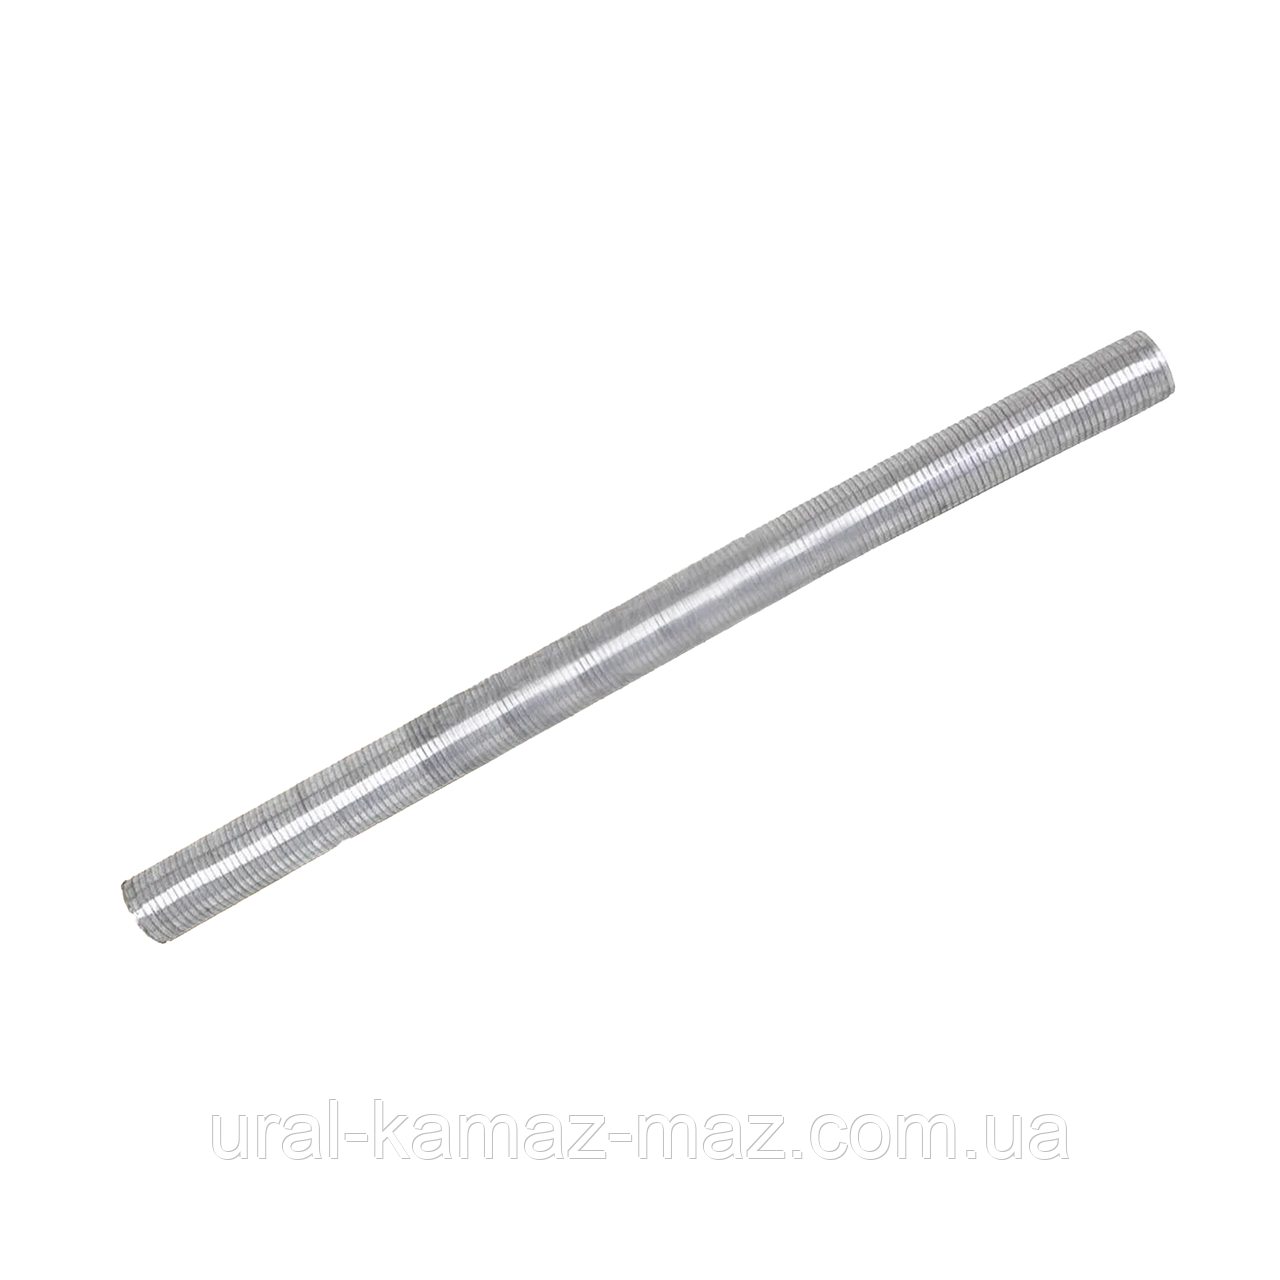 Гофрированная труба оцинкованная сталь 90 мм 1,5м без фланцев